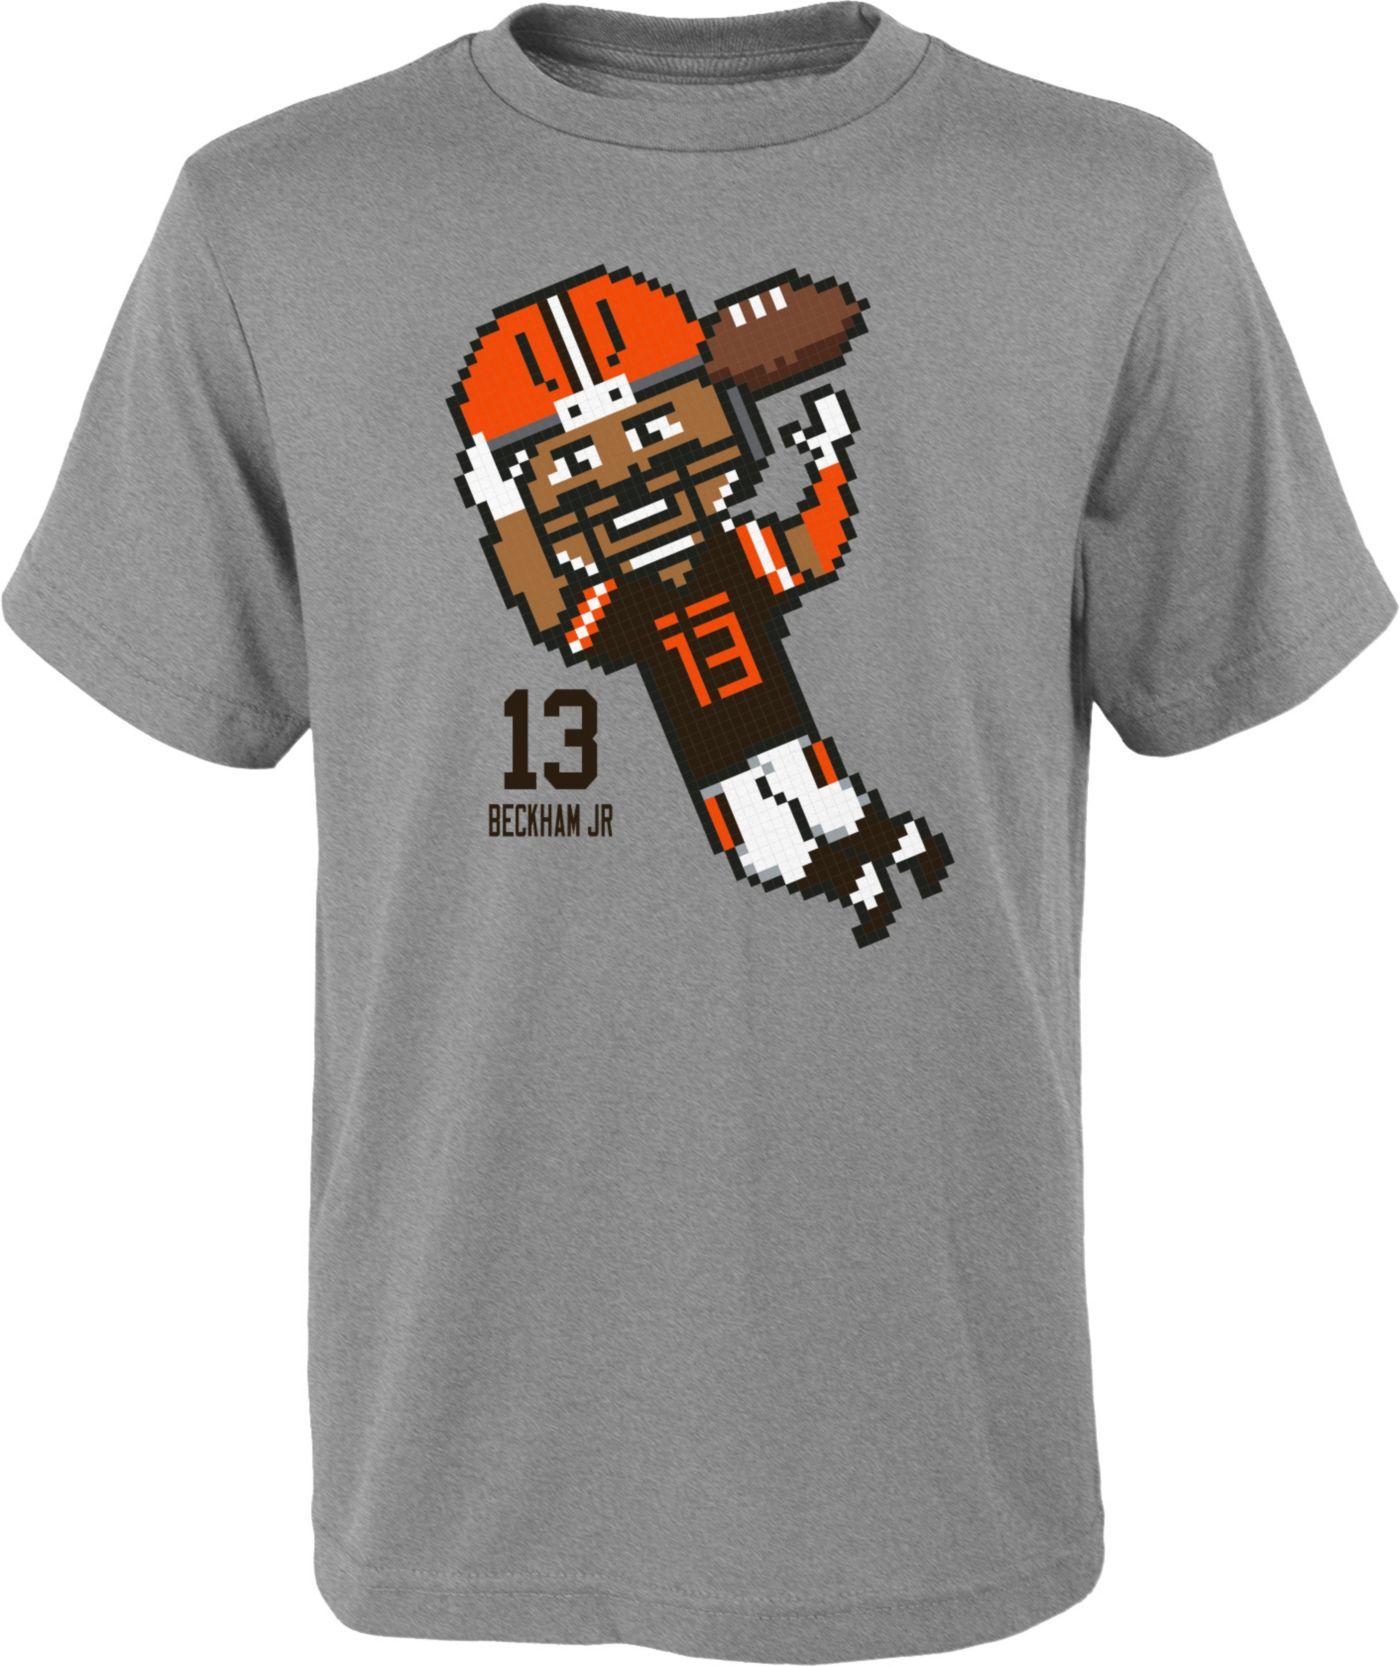 NFL Team Apparel Youth Cleveland Browns Odell Beckham Jr. #13 Pixel T-Shirt